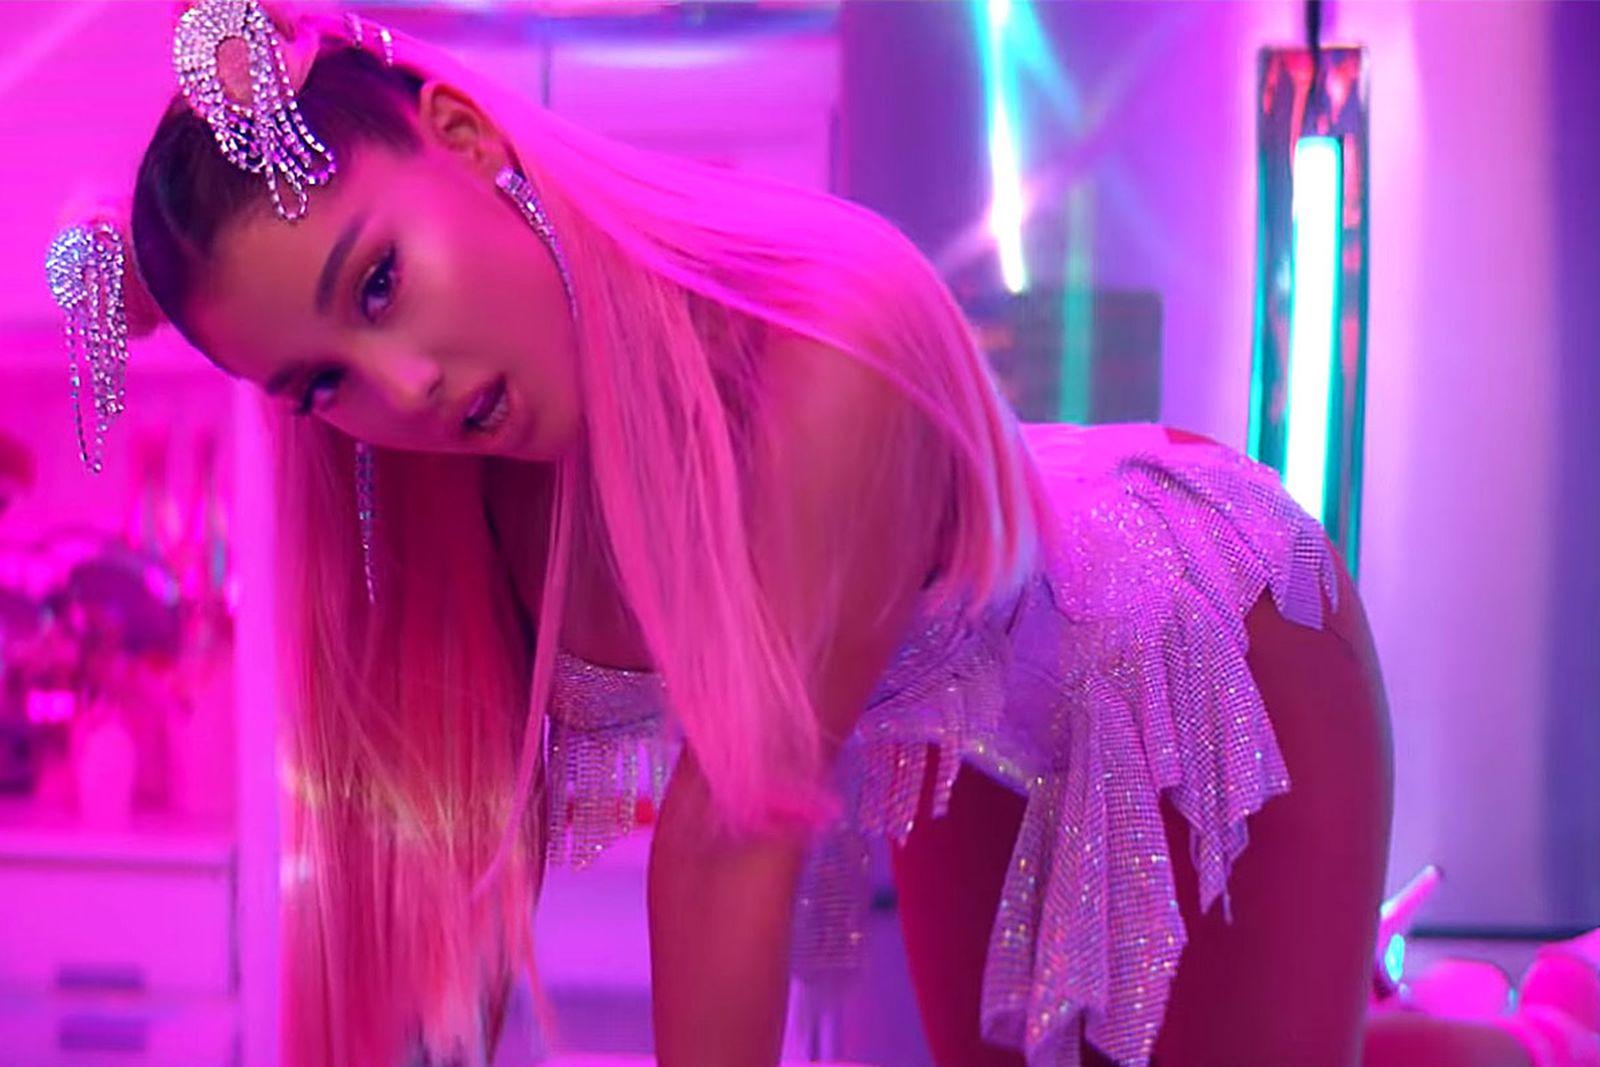 fyre festival man purses best comments roundup A$AP Rocky Ariana Grande Converse